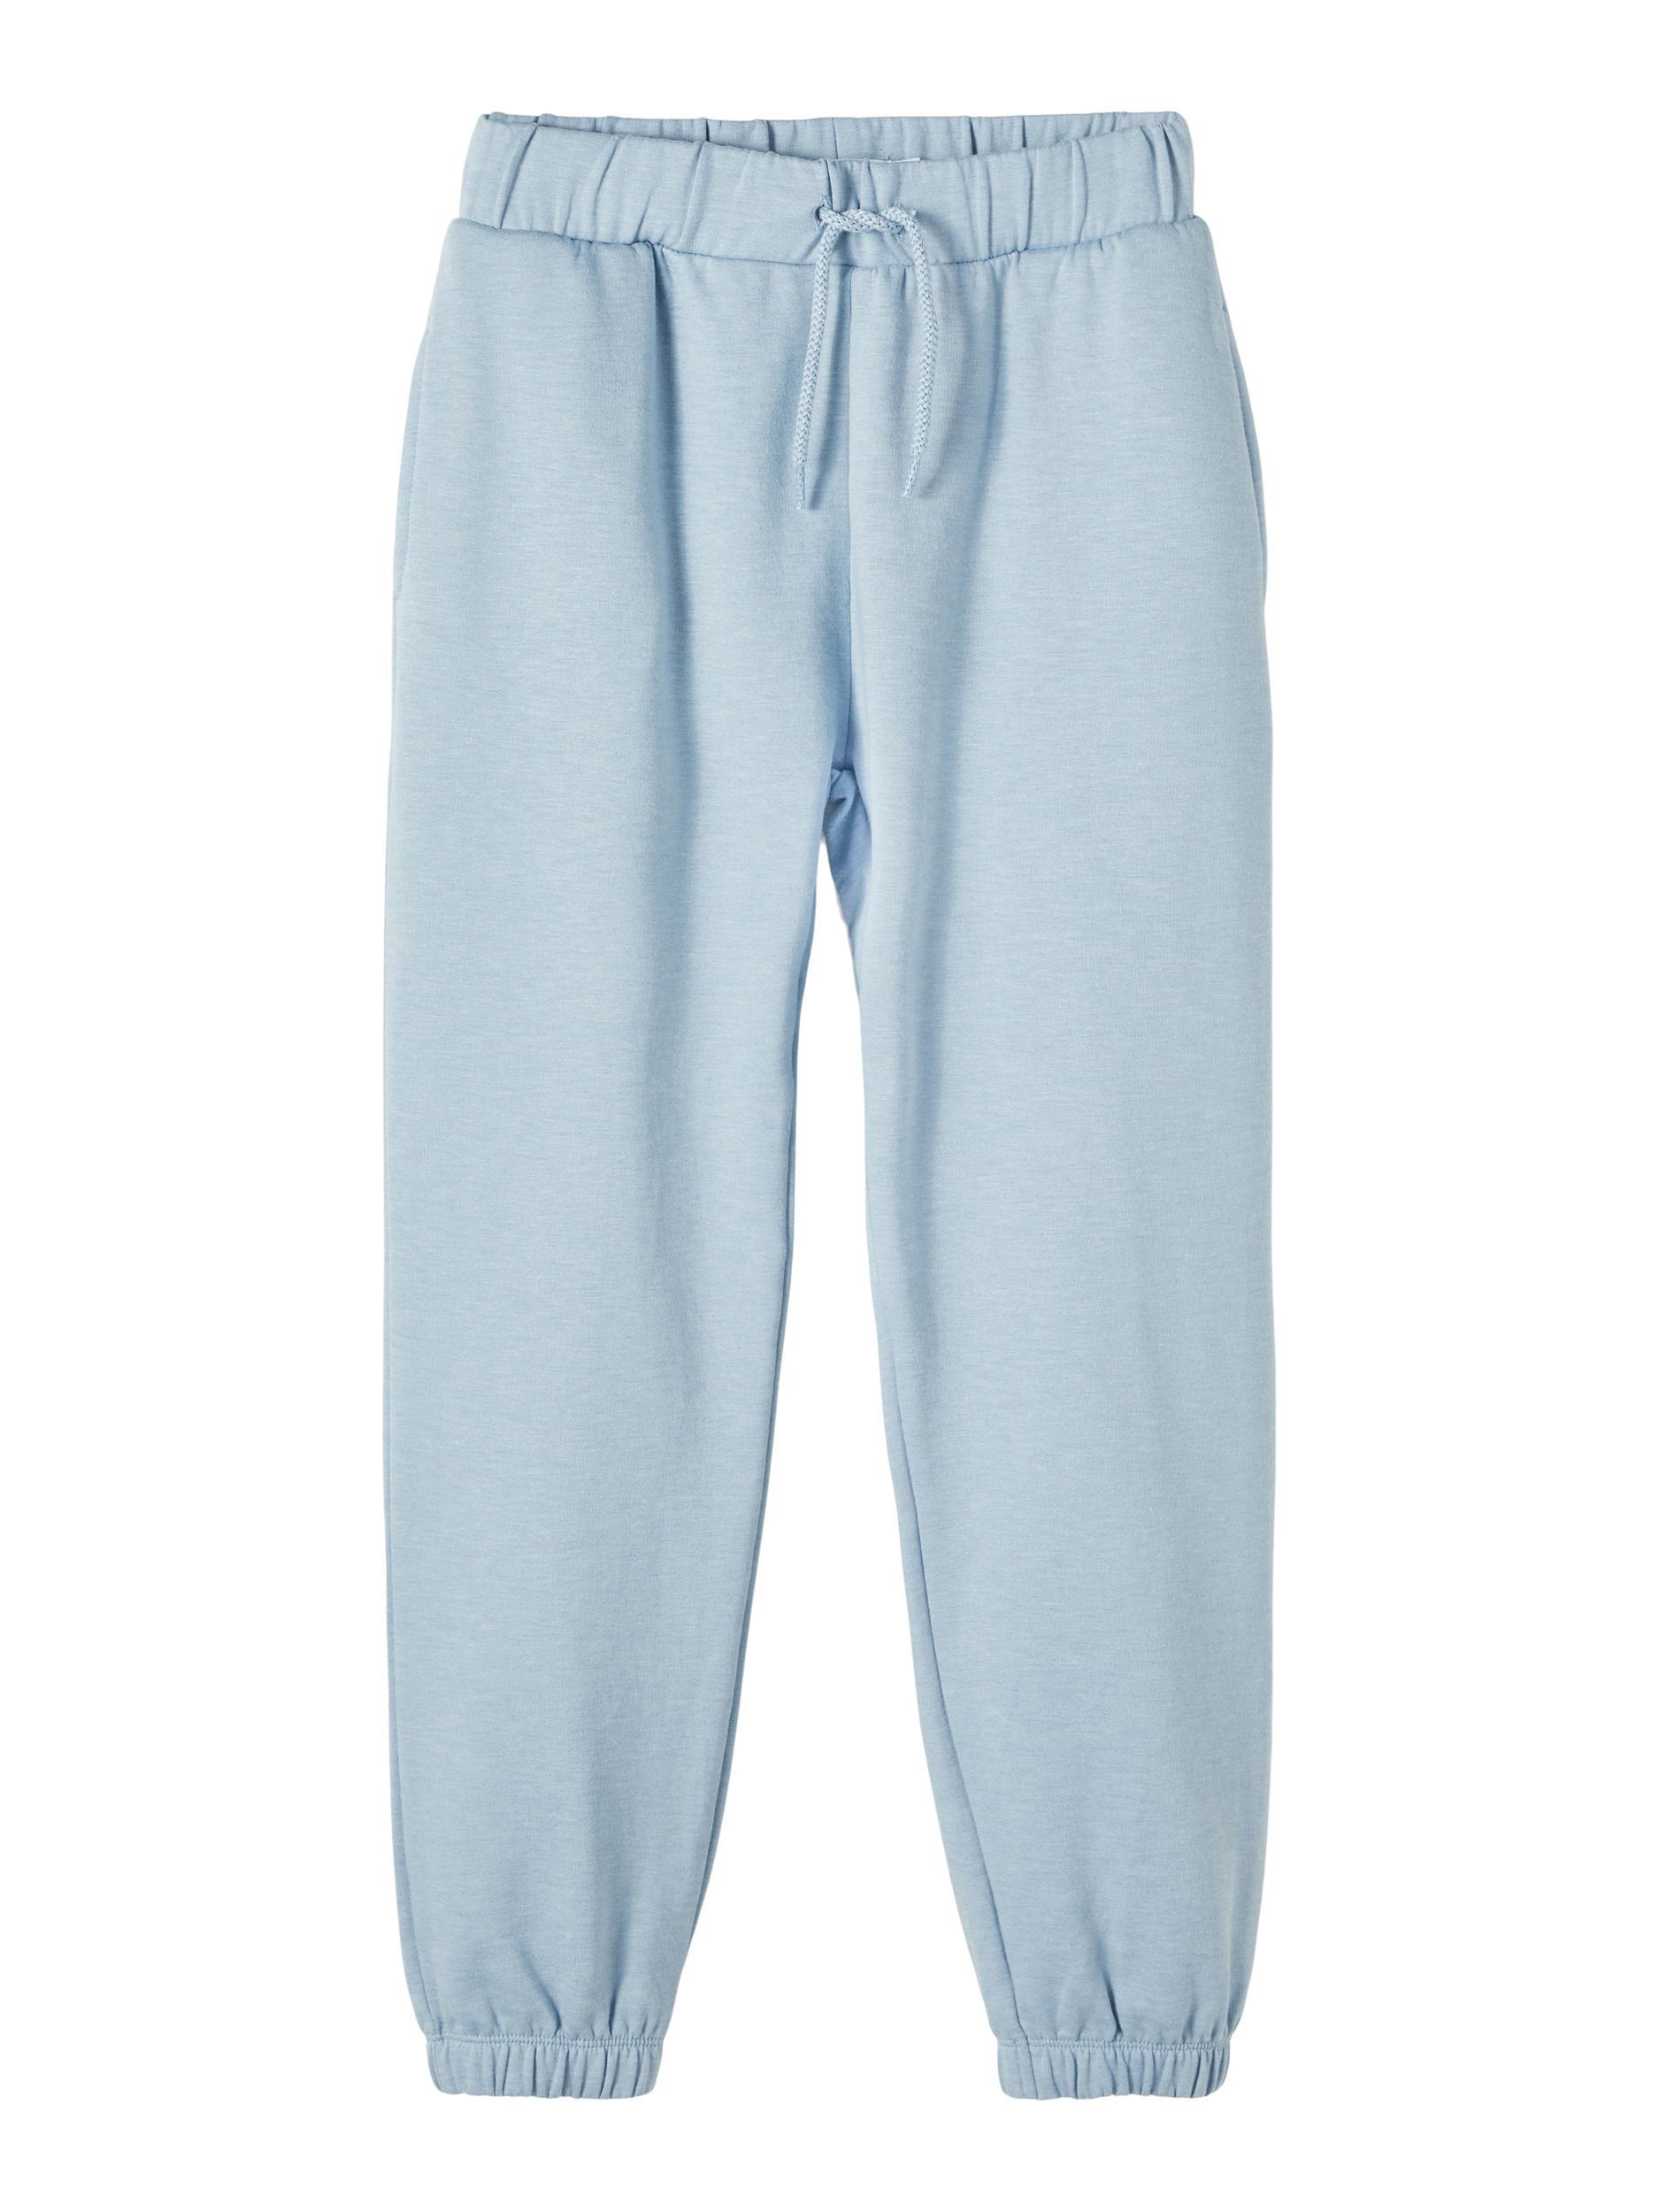 Name It sweatpants, dusty blue, 122